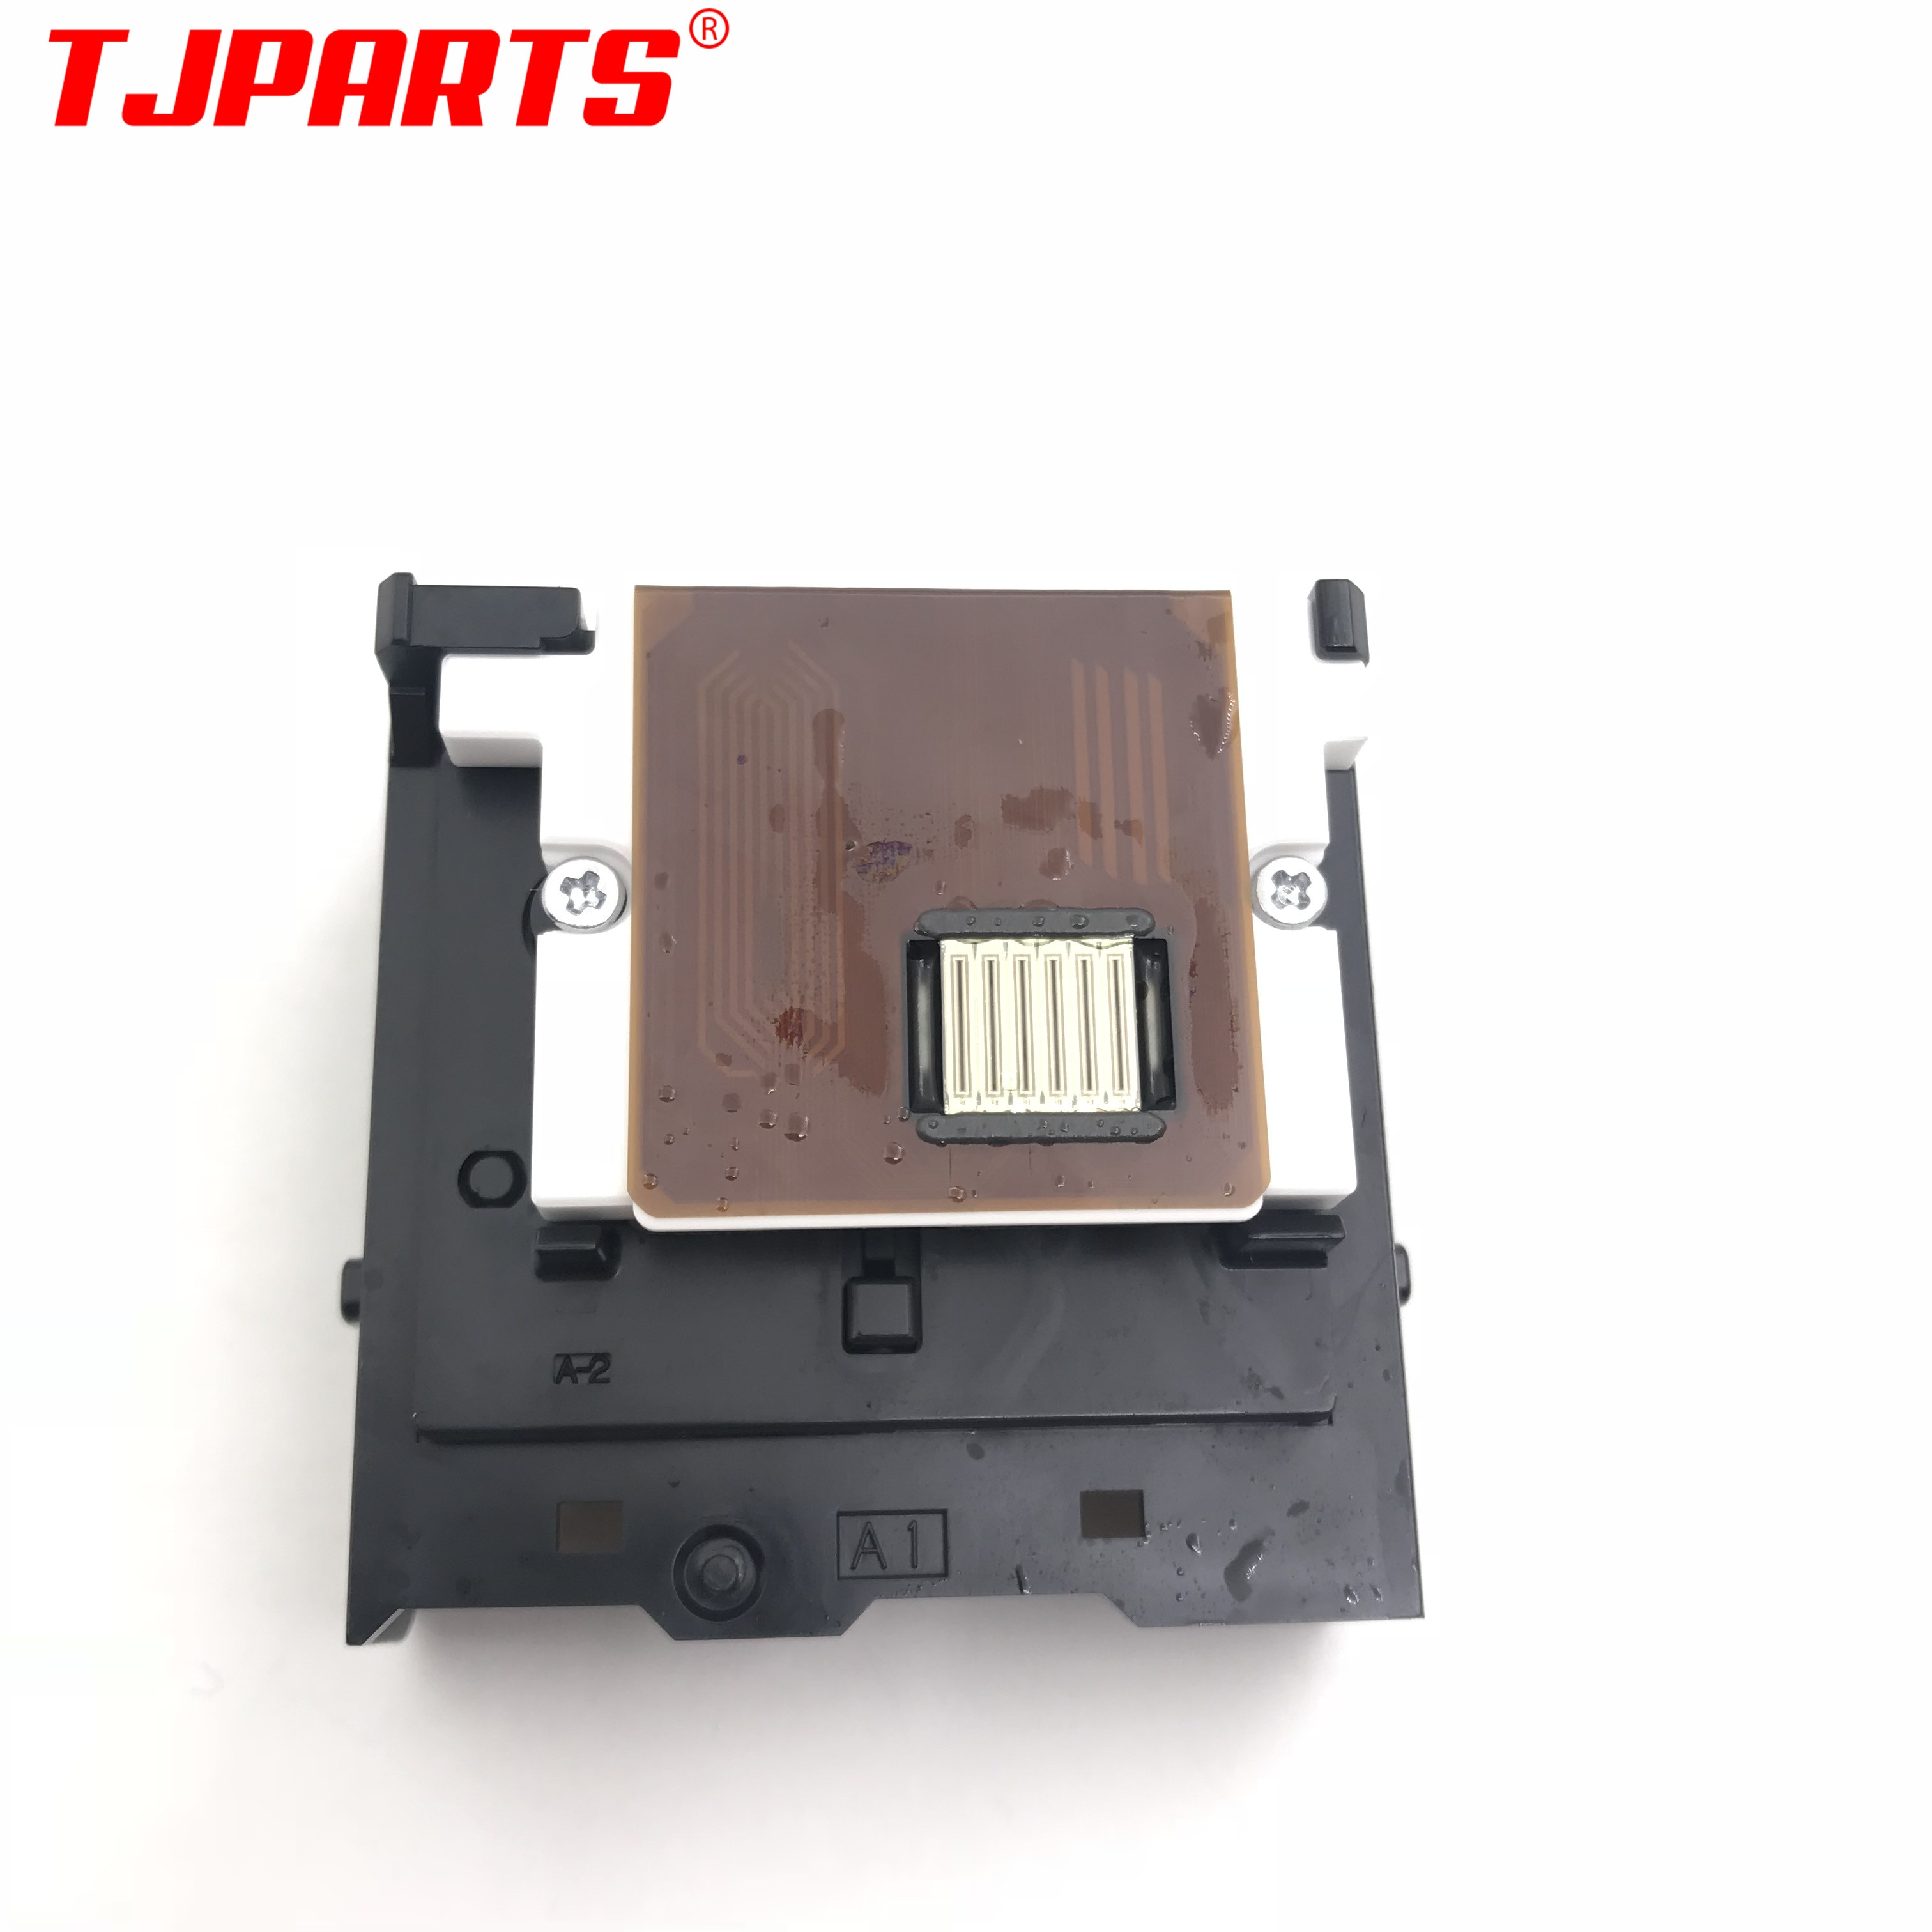 اليابان جديد QY6-0069 QY6-0069-000 رأس الطباعة رأس الطباعة رأس الطابعة لكانون mini260 mini320